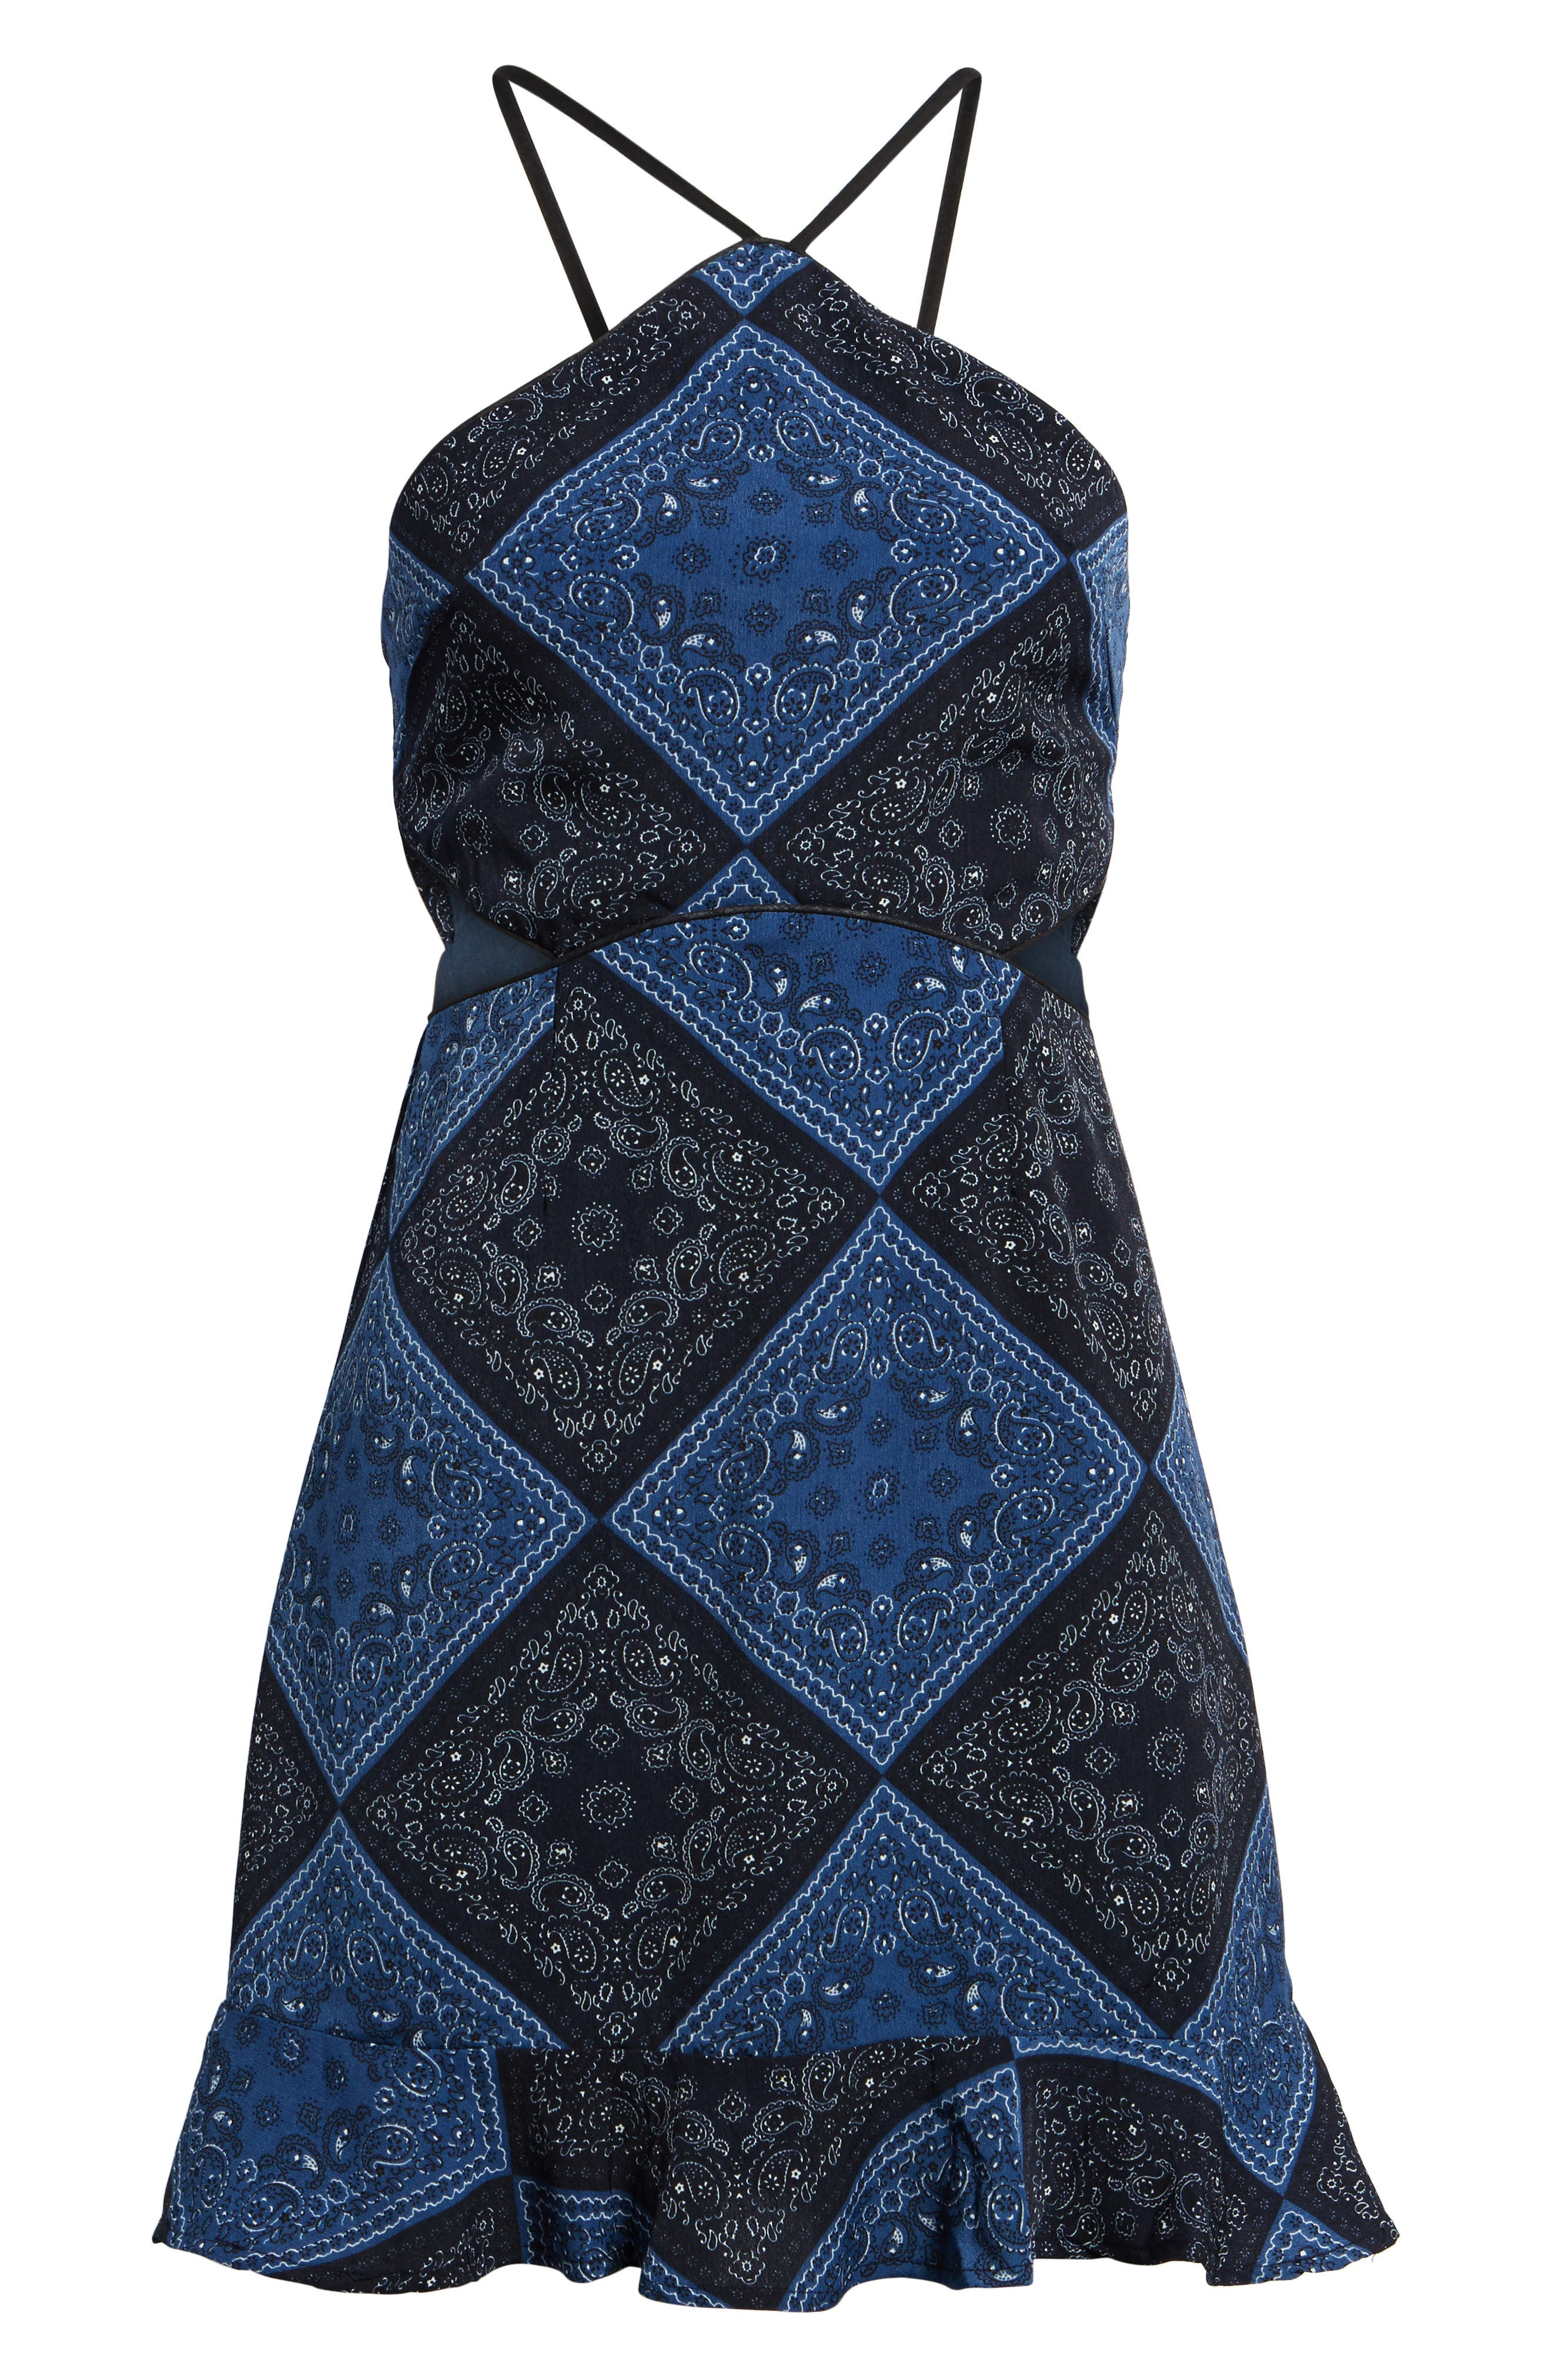 Bandana Bella Dress,                             Alternate thumbnail 6, color,                             400